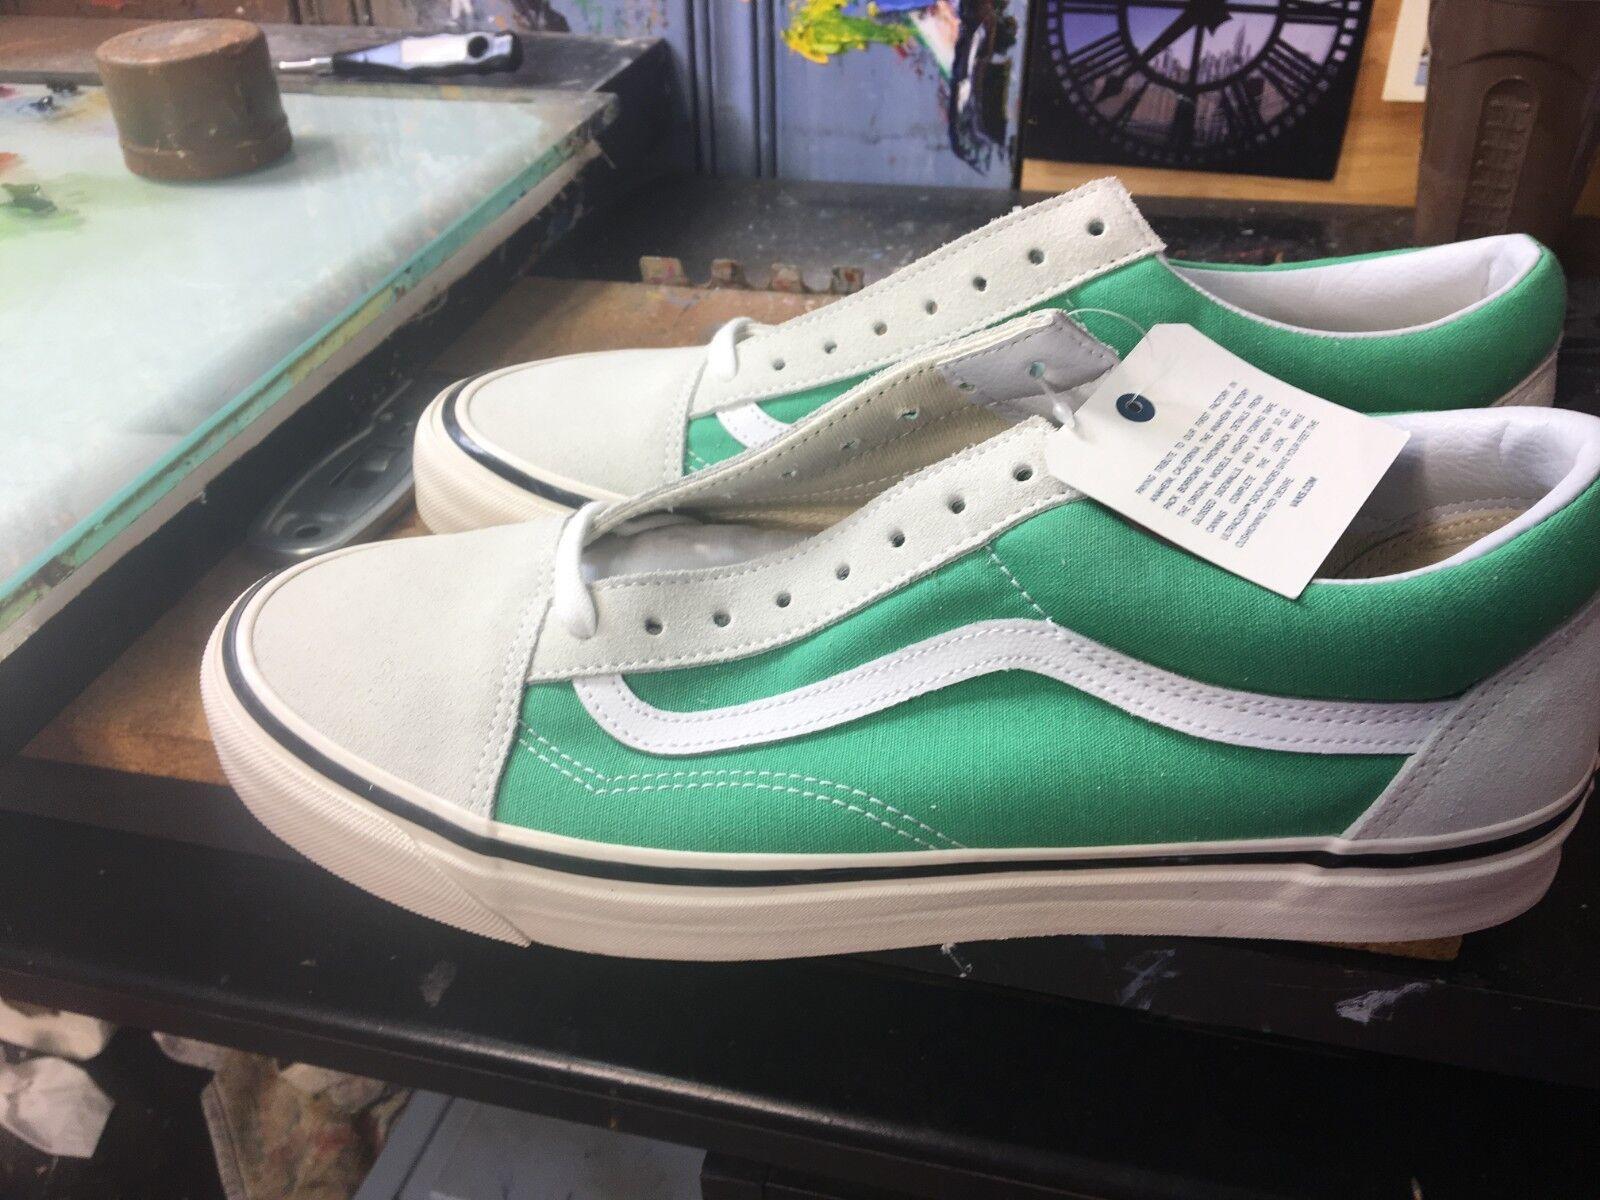 Vans Old Factory) Skool 36 DX (Anaheim Factory) Old verde/bianca Size US 12 Uomo VN0A38G2R1X 084727